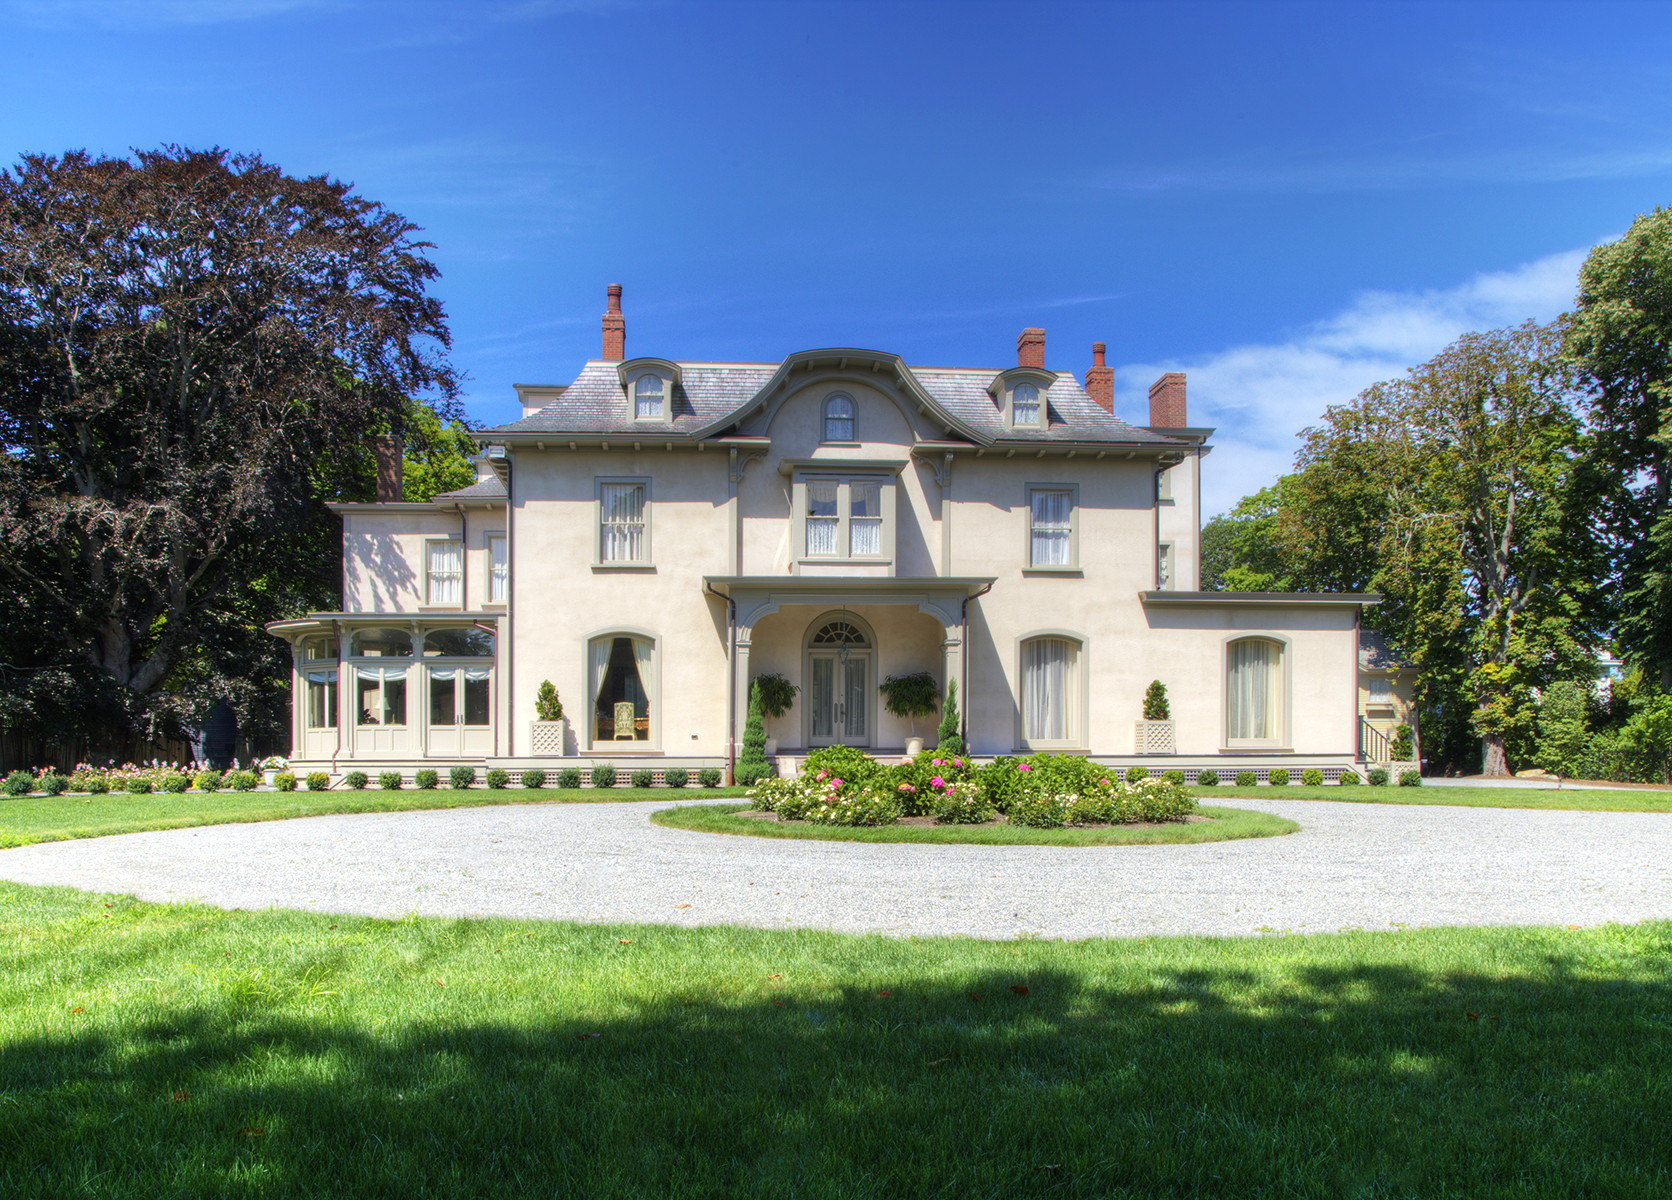 Single Family Home for Sale at Quatrel 673 Bellevue Avenue Newport, Rhode Island 02840 United States